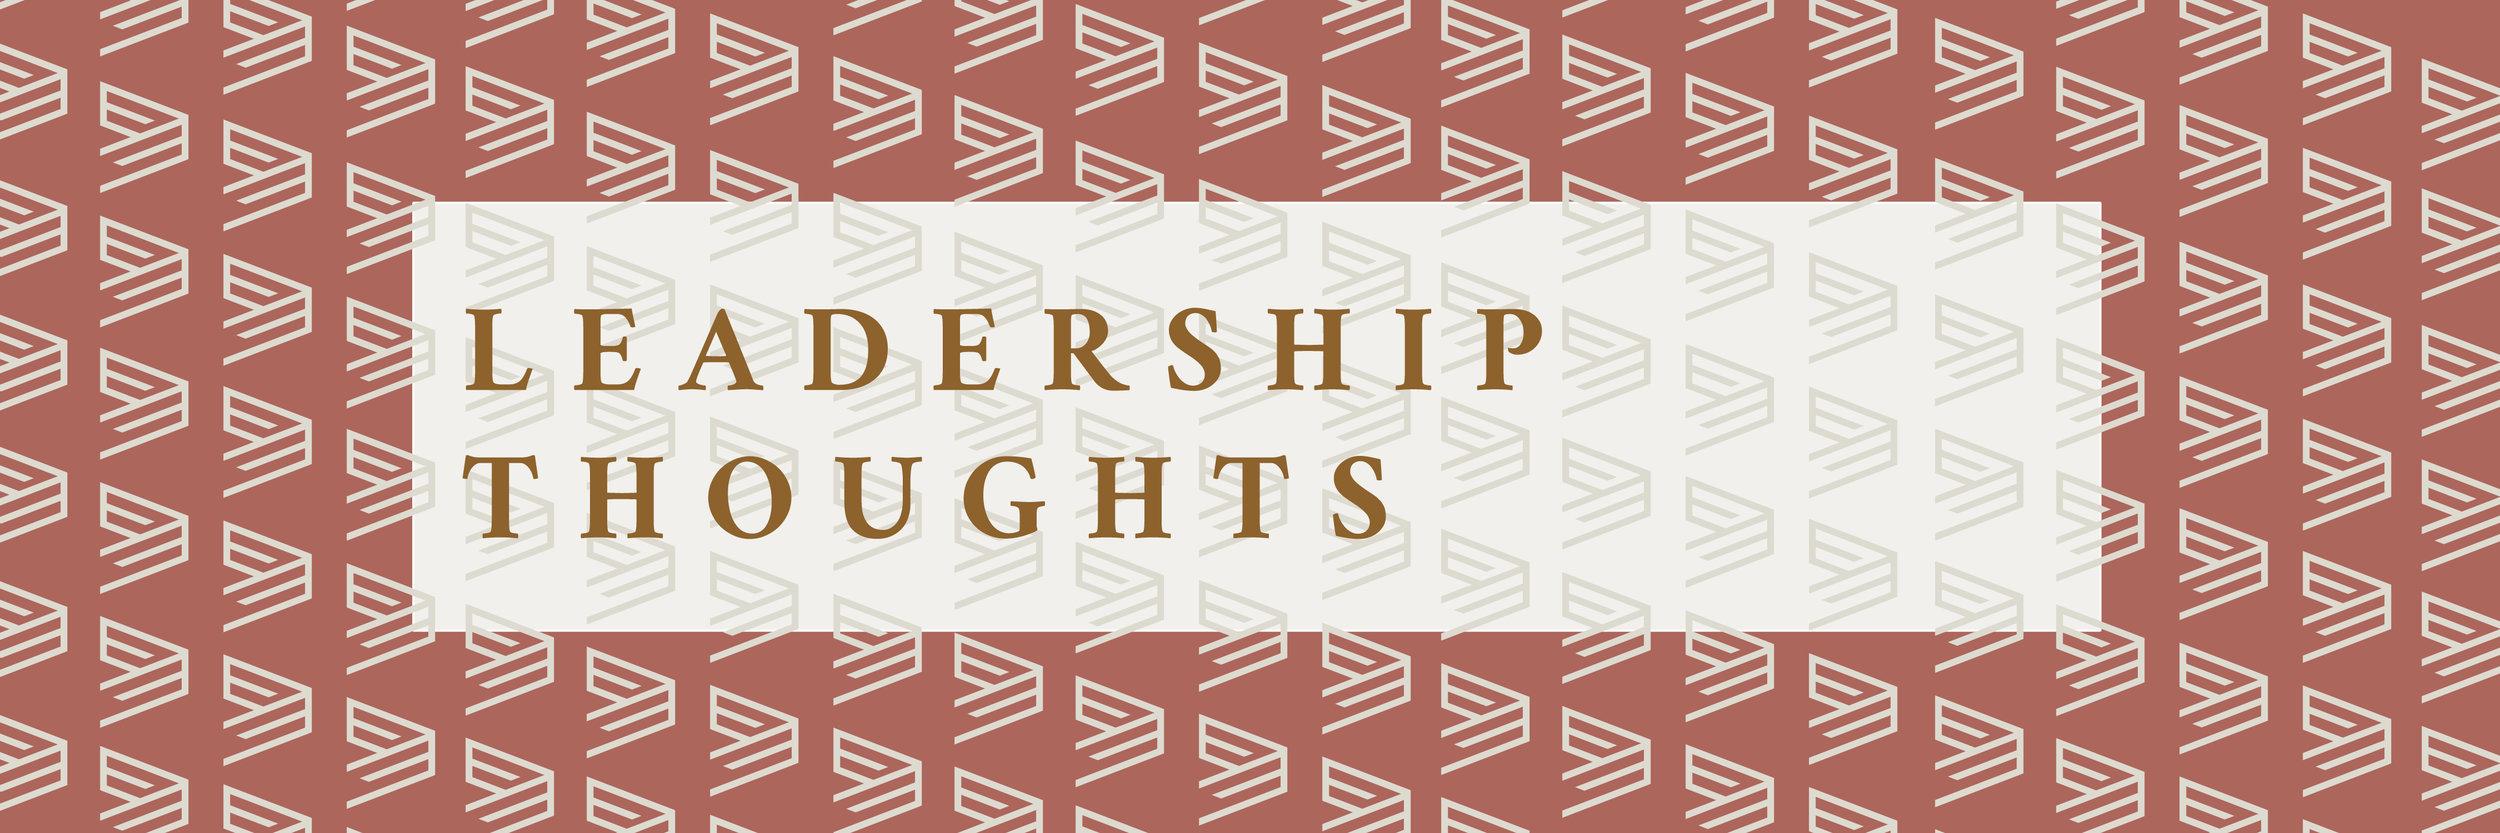 Leadership Thoughts.jpg